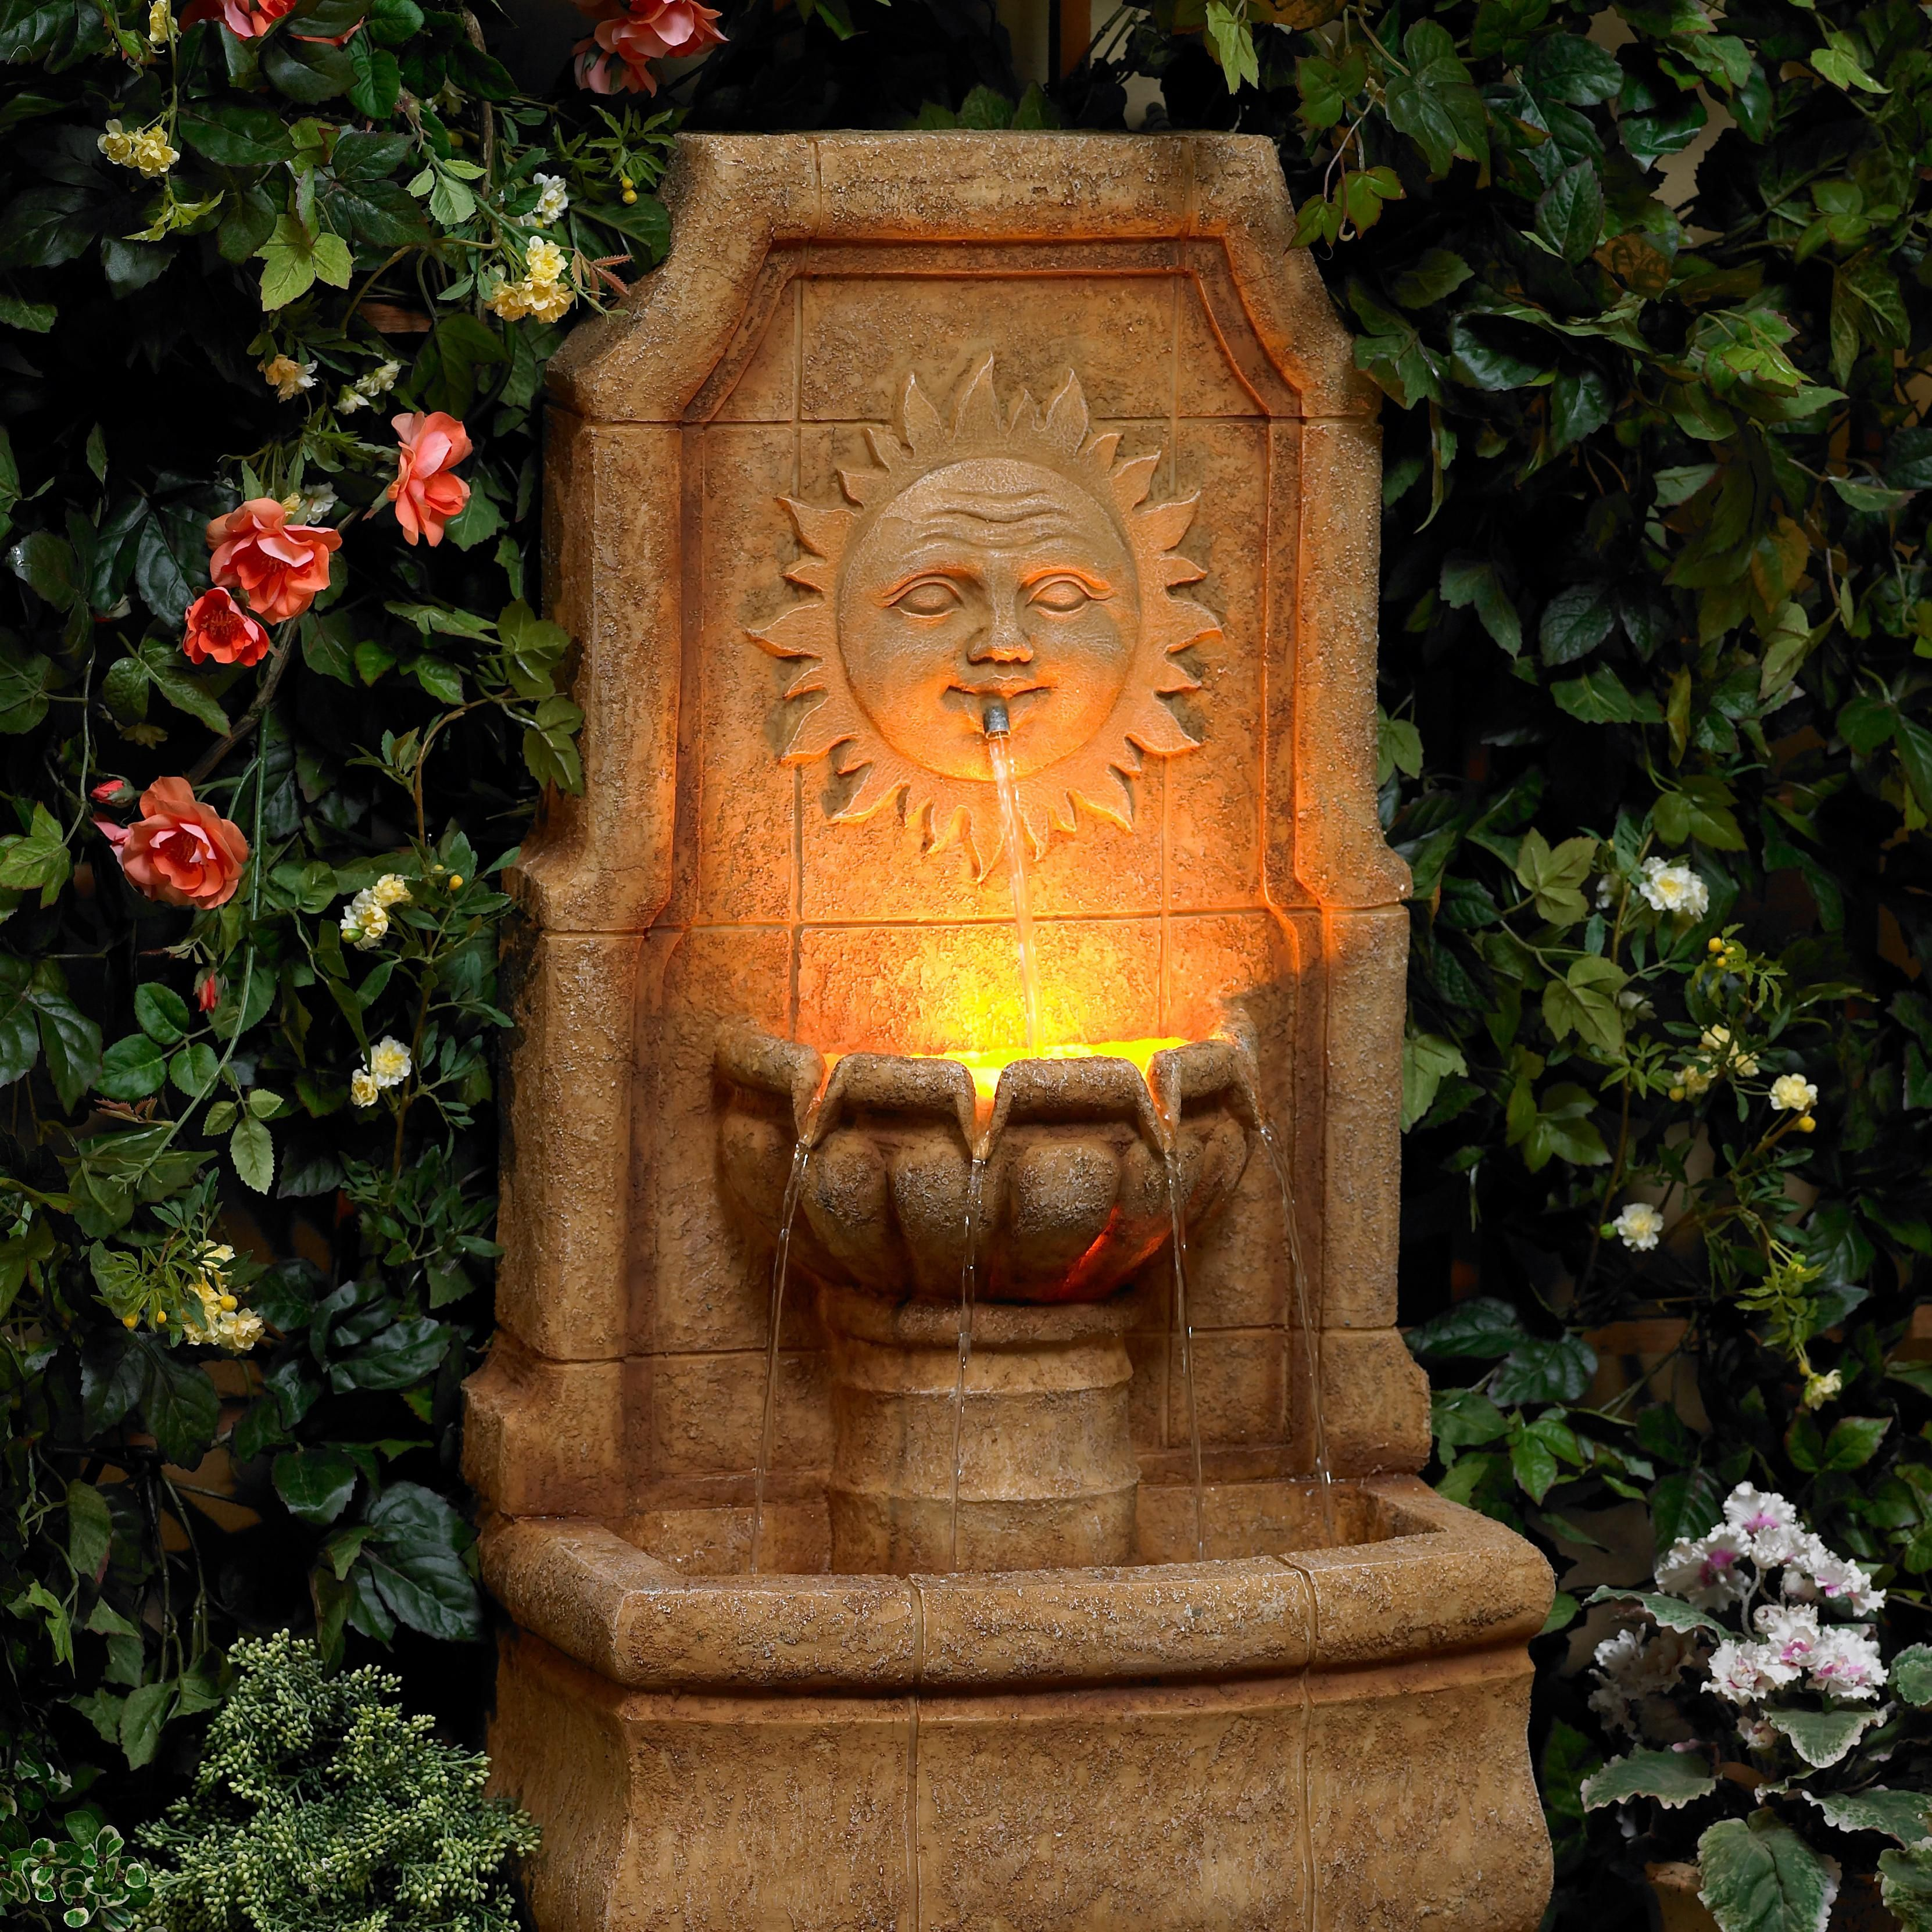 Sun villa faux stone 37h outdoor fountain with led lights outdoor sun villa faux stone 37h outdoor fountain with led lights workwithnaturefo